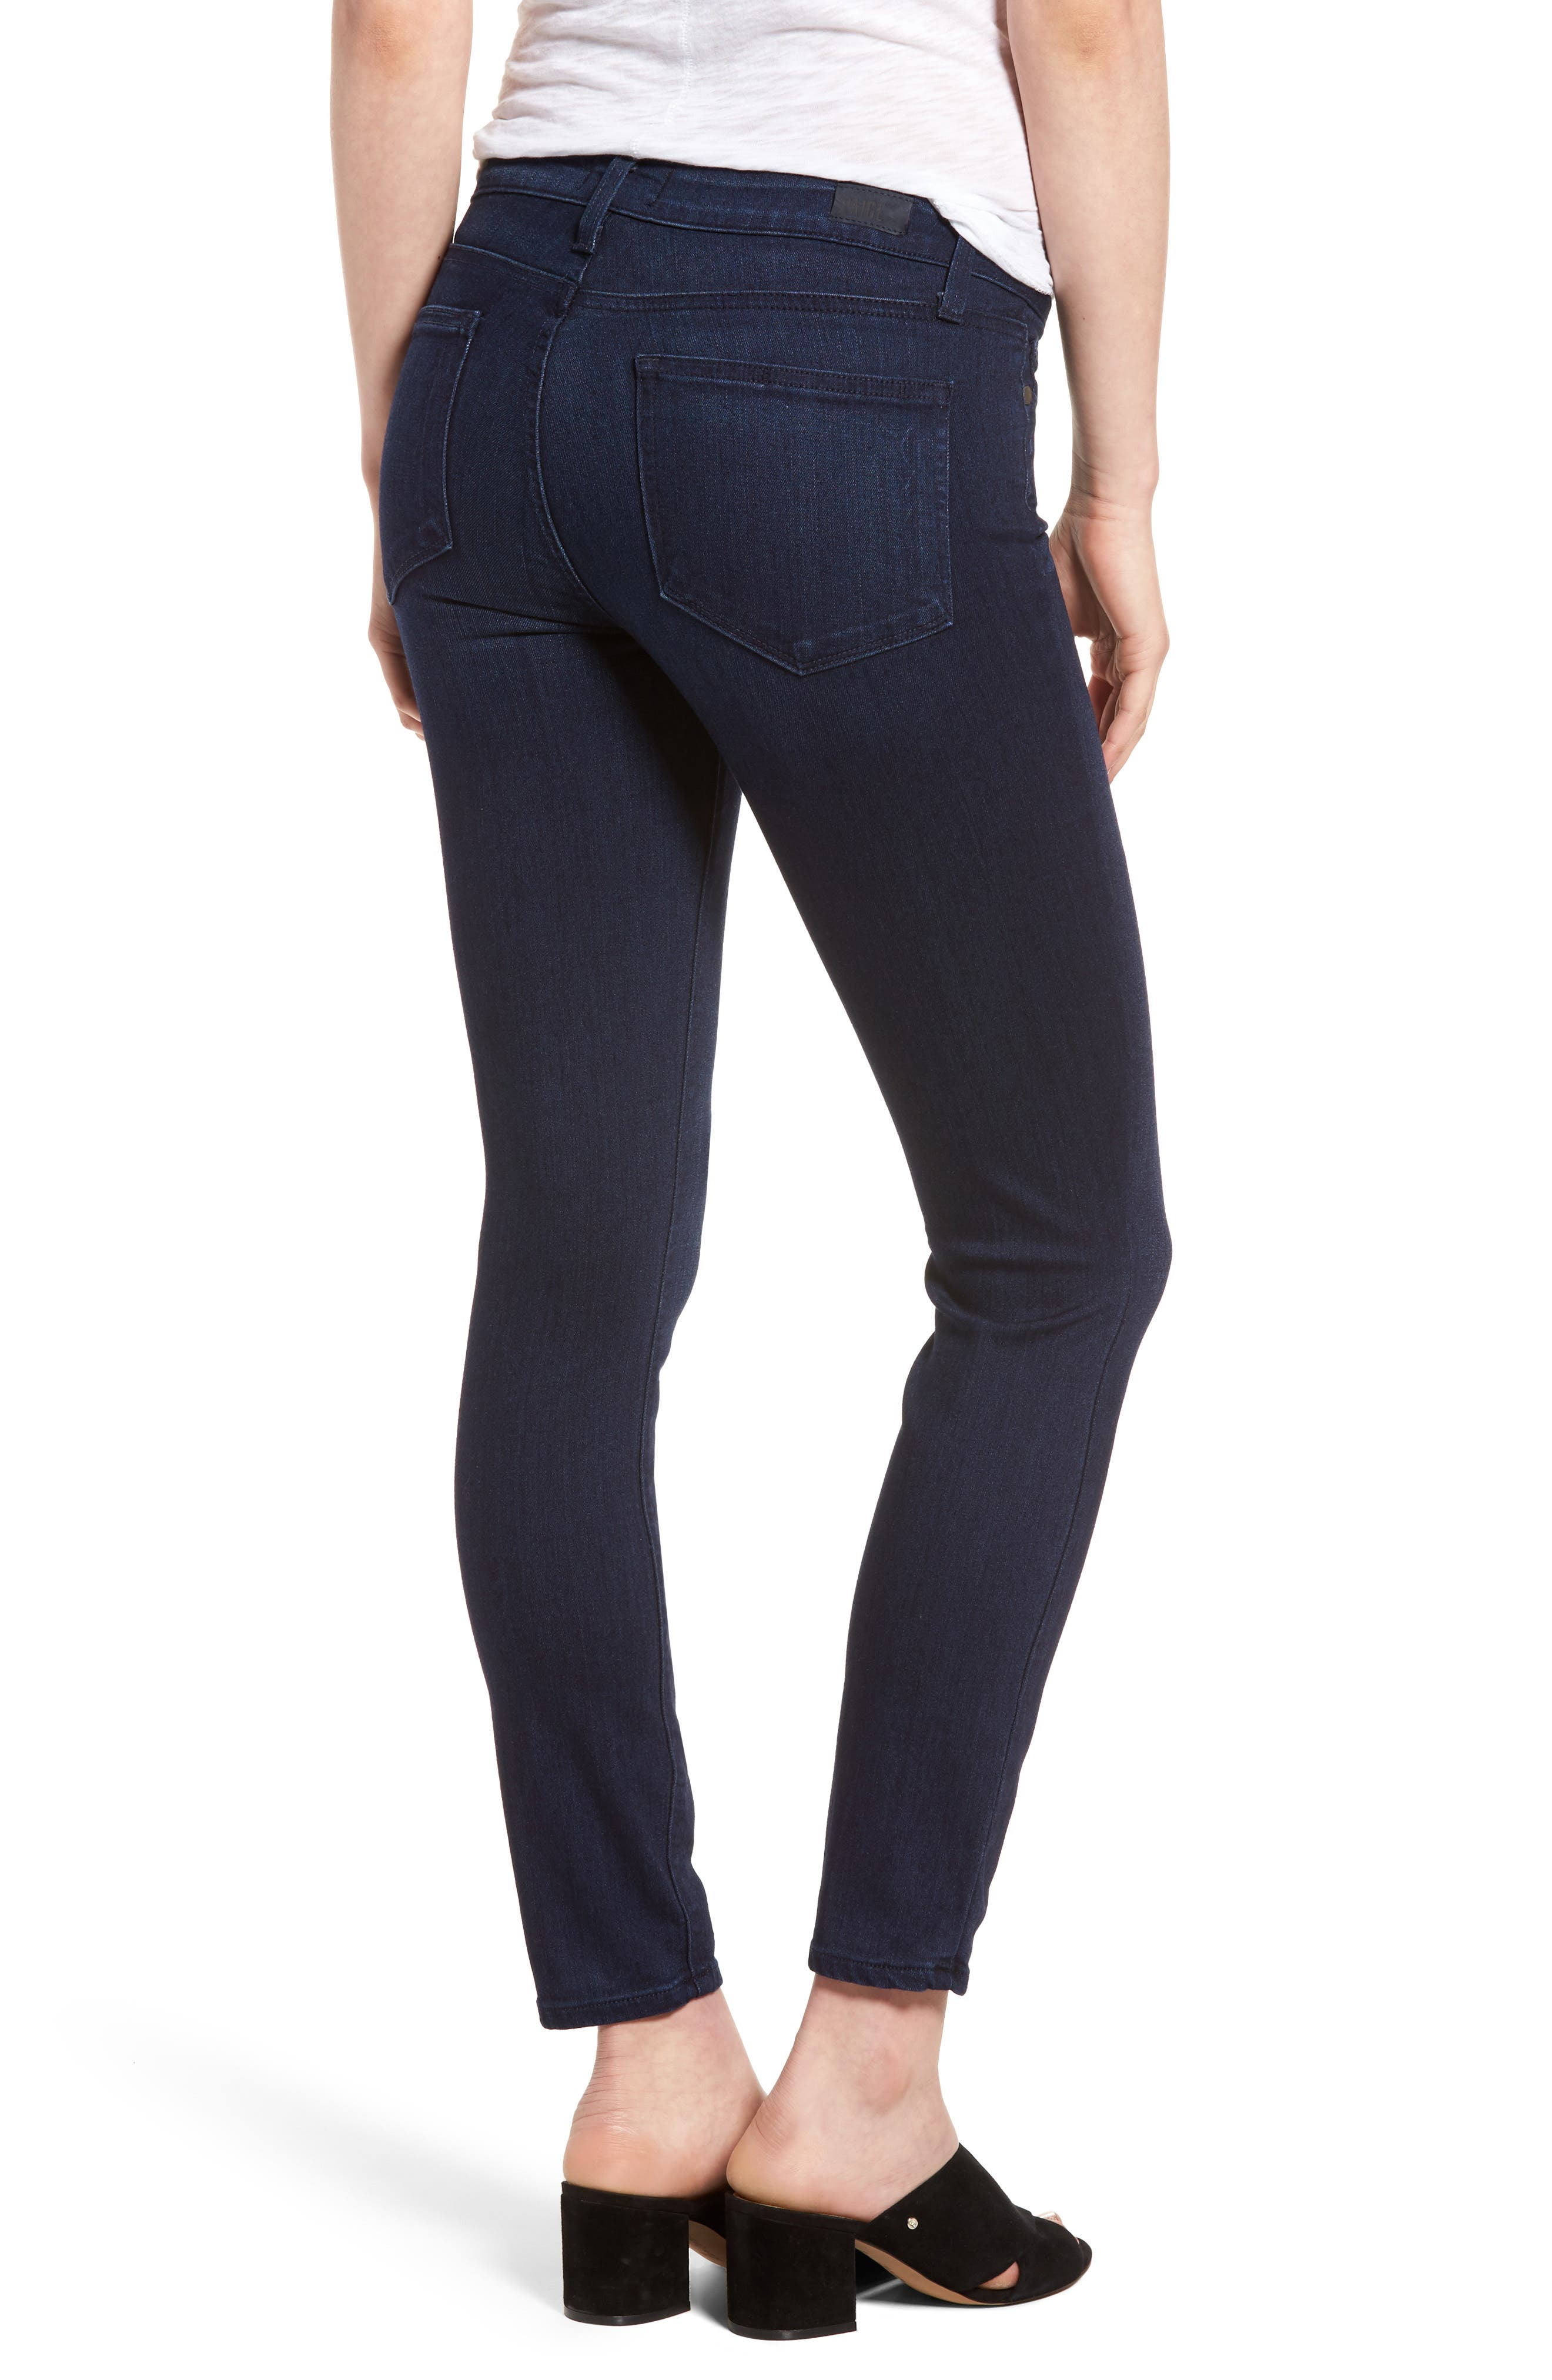 Verdugo Ankle Skinny Jeans,                             Alternate thumbnail 2, color,                             400